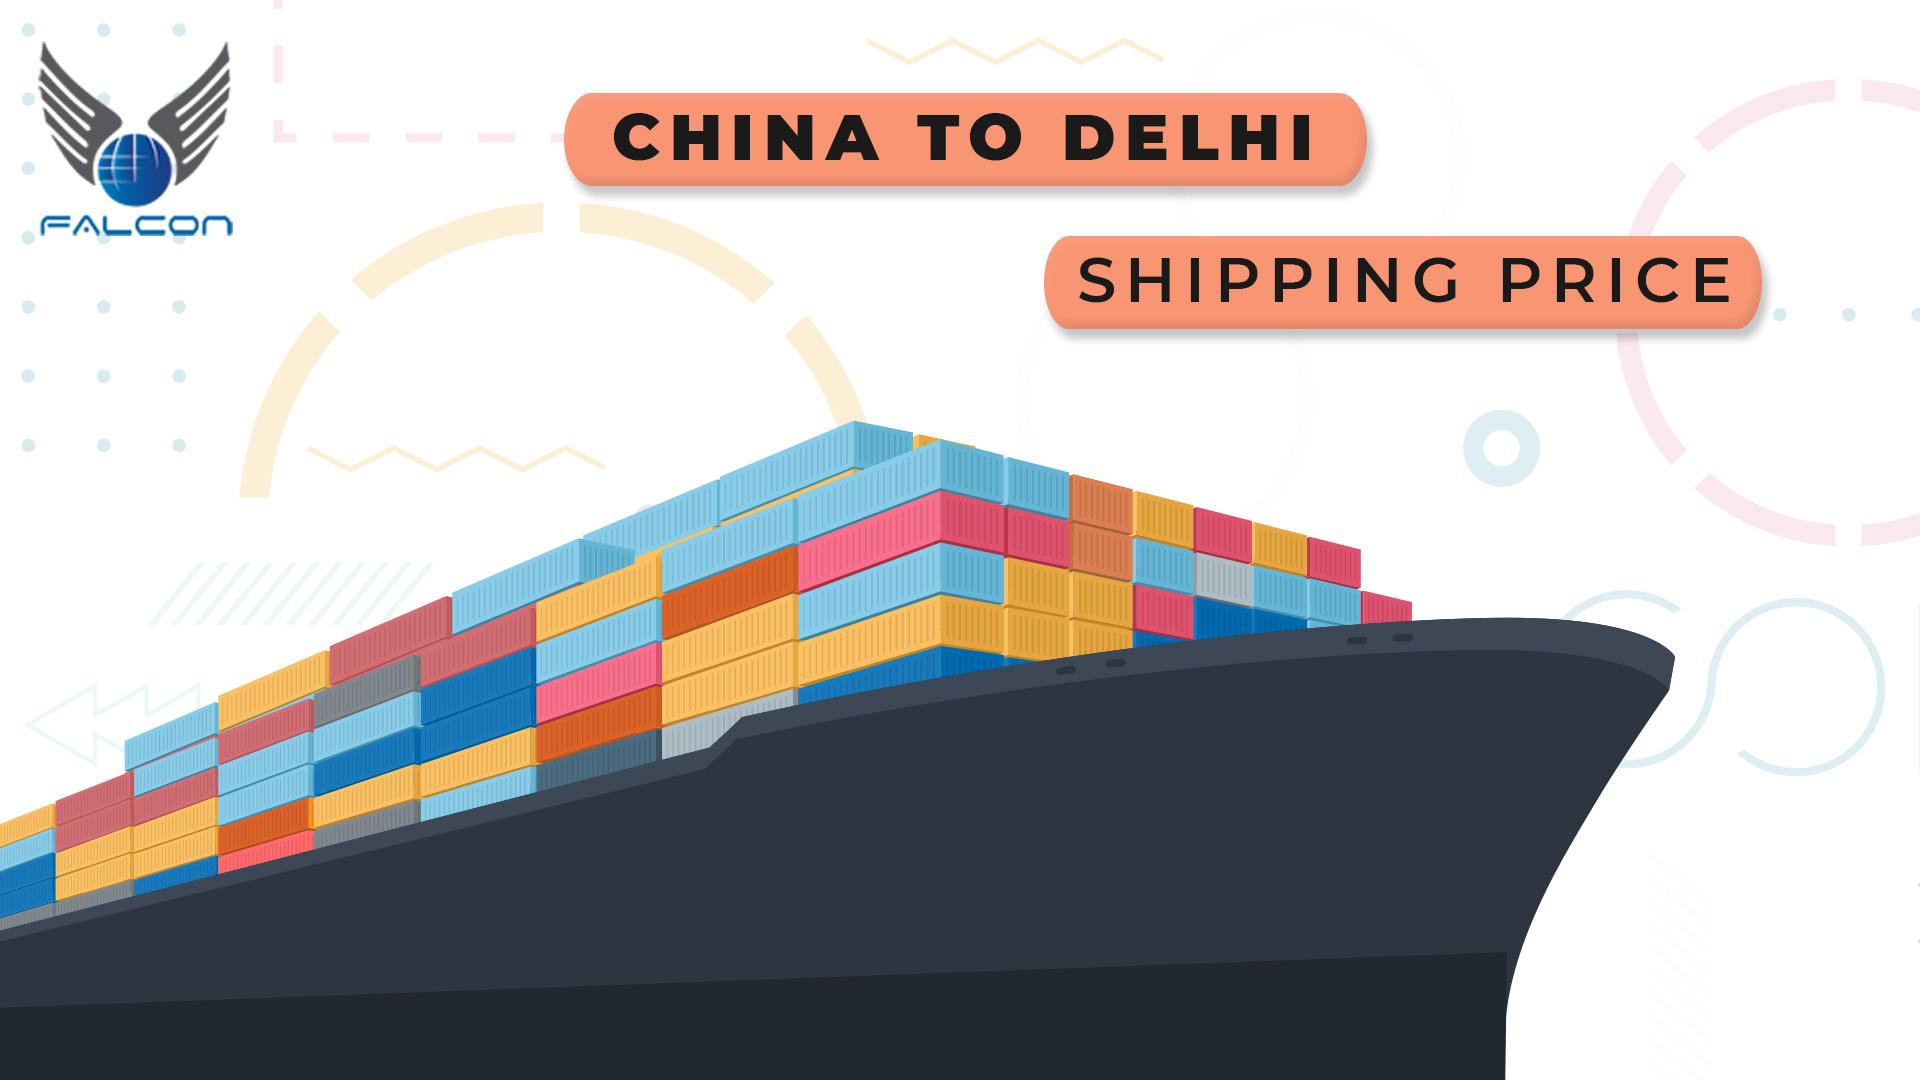 China to Delhi Shipping Price